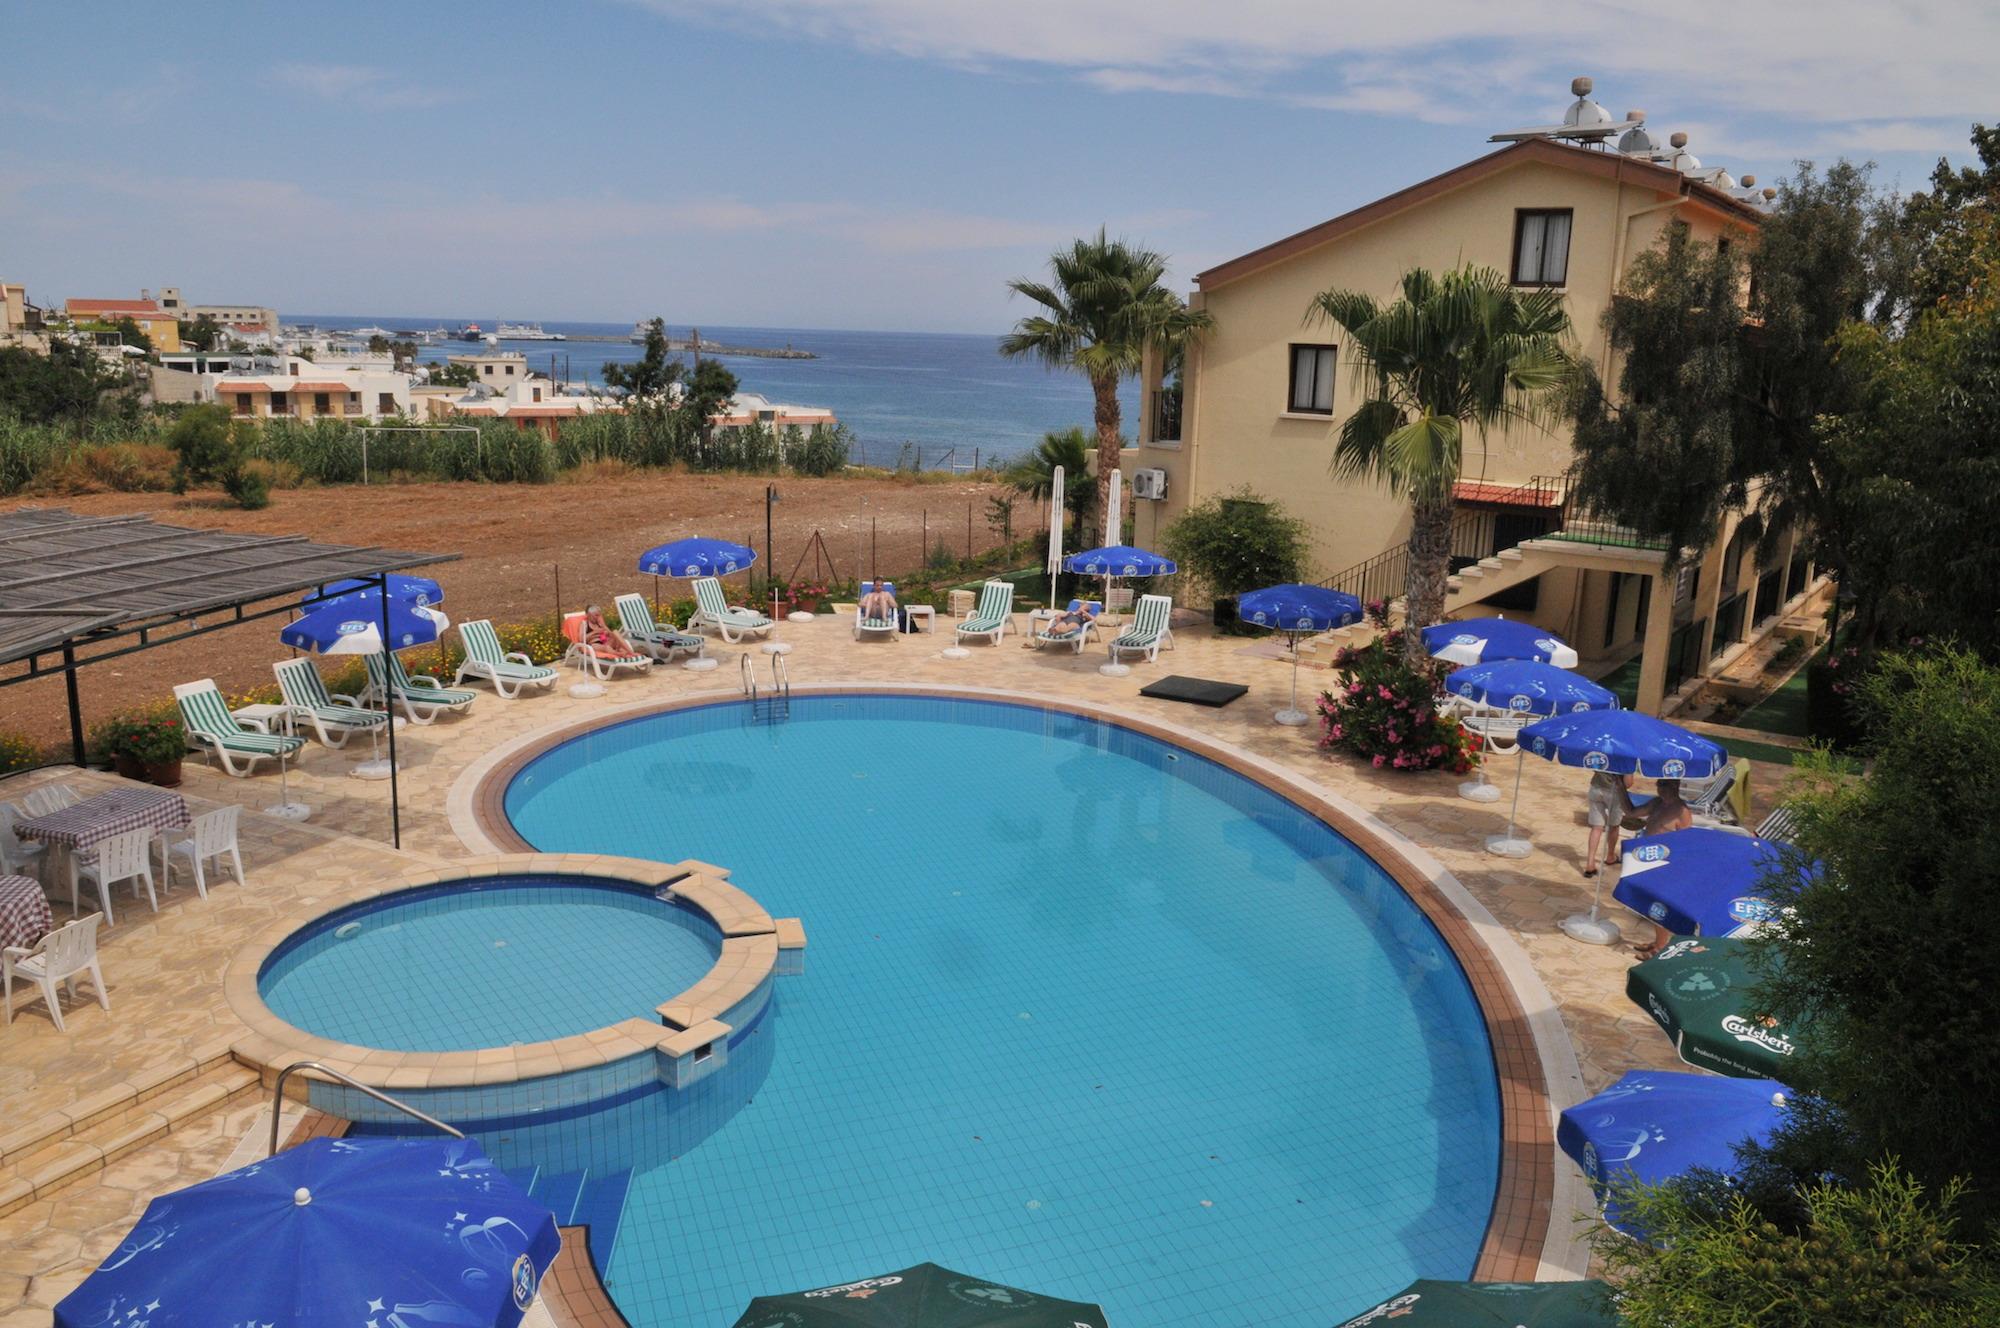 High Life Hotel (Kyrenia) : Diamond Sky Holidays